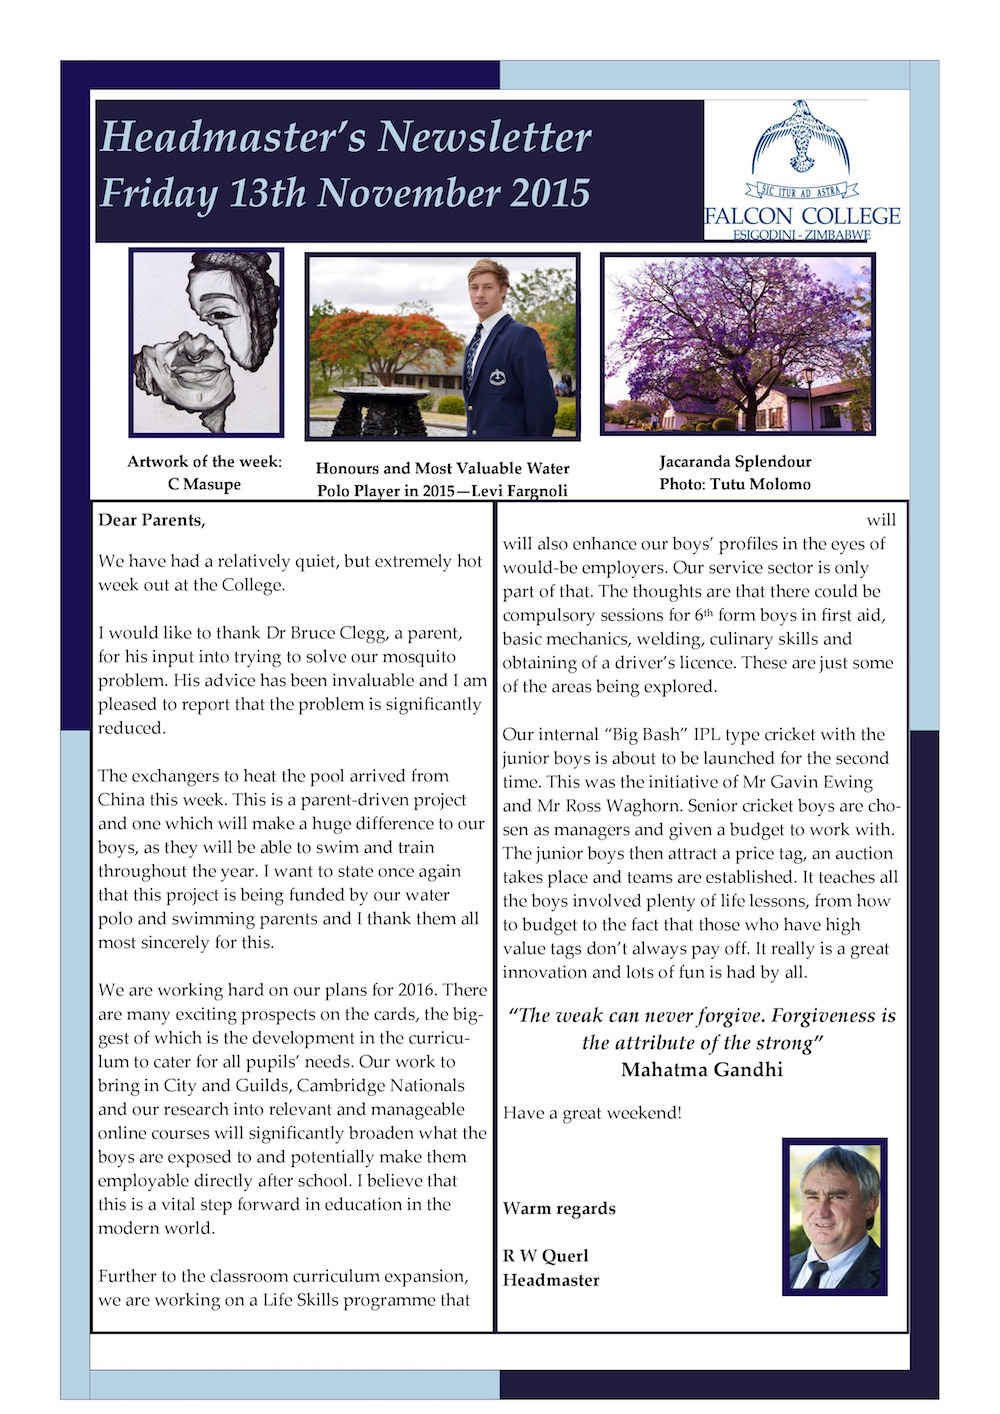 Headmaster's Newsletter Friday 13th November 2015 edited-page-0